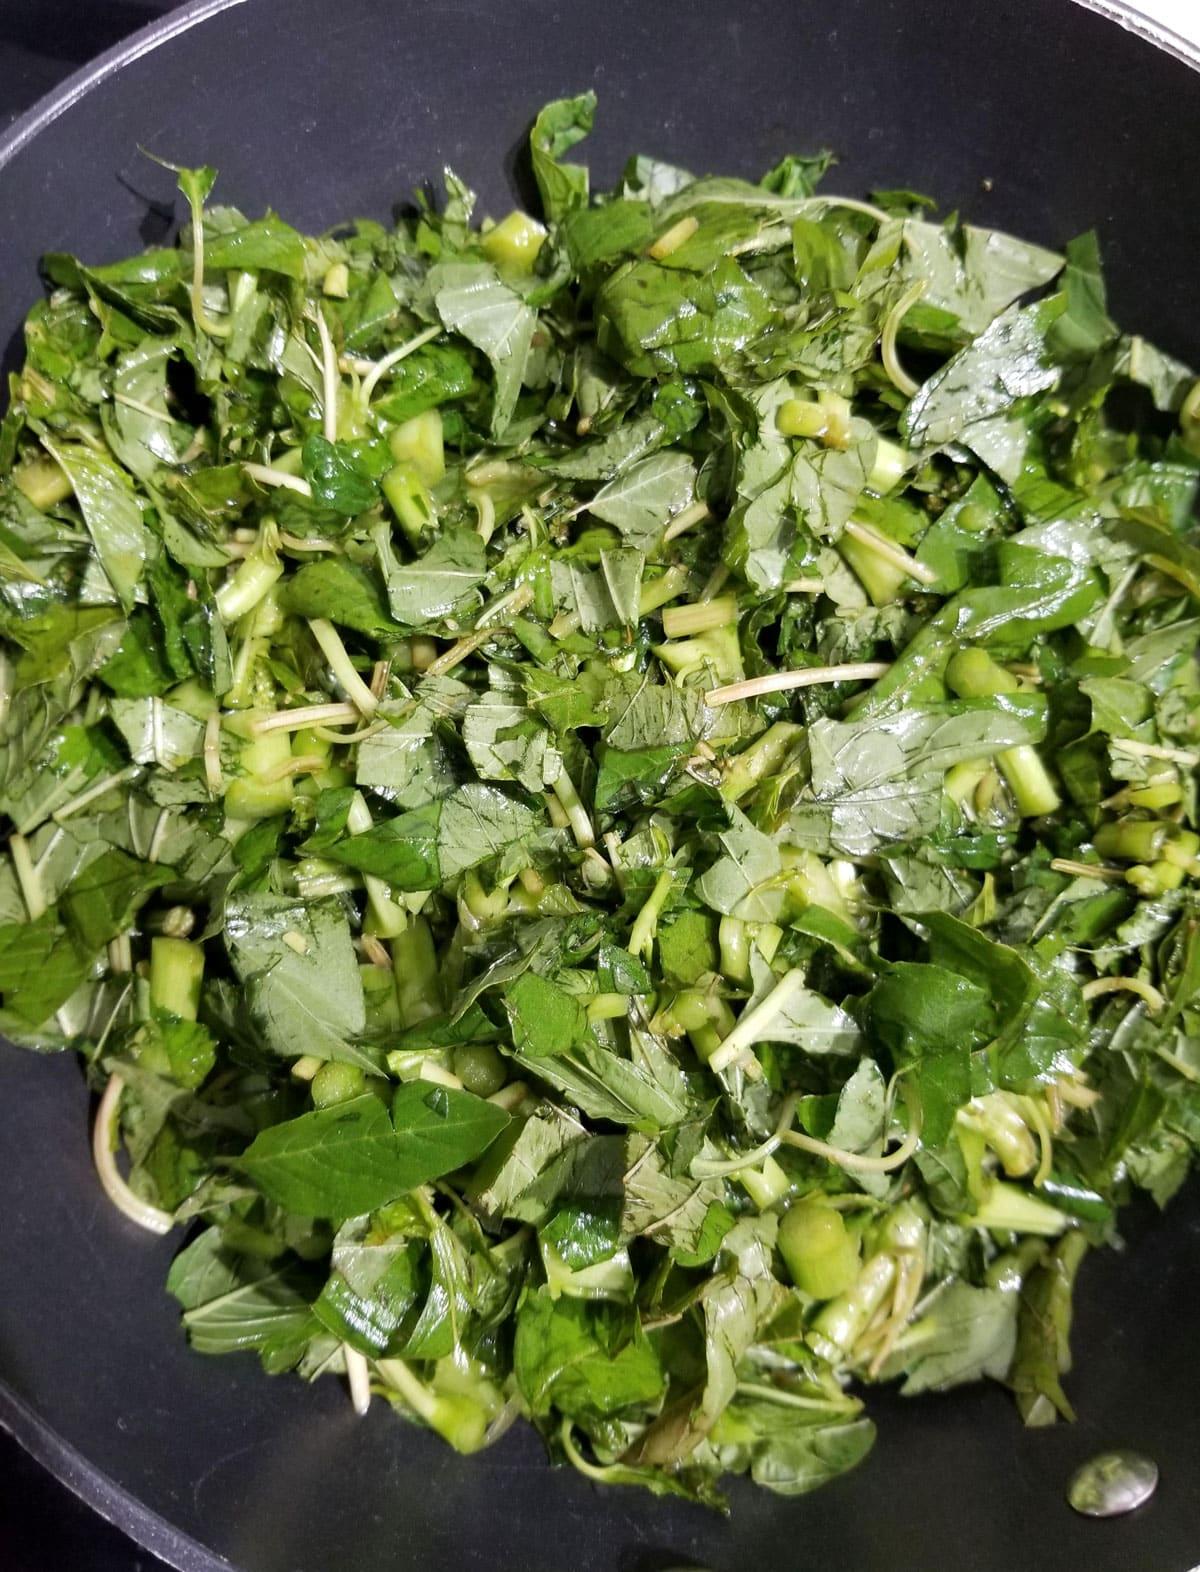 cooking amaranth leaves in pan or skillet